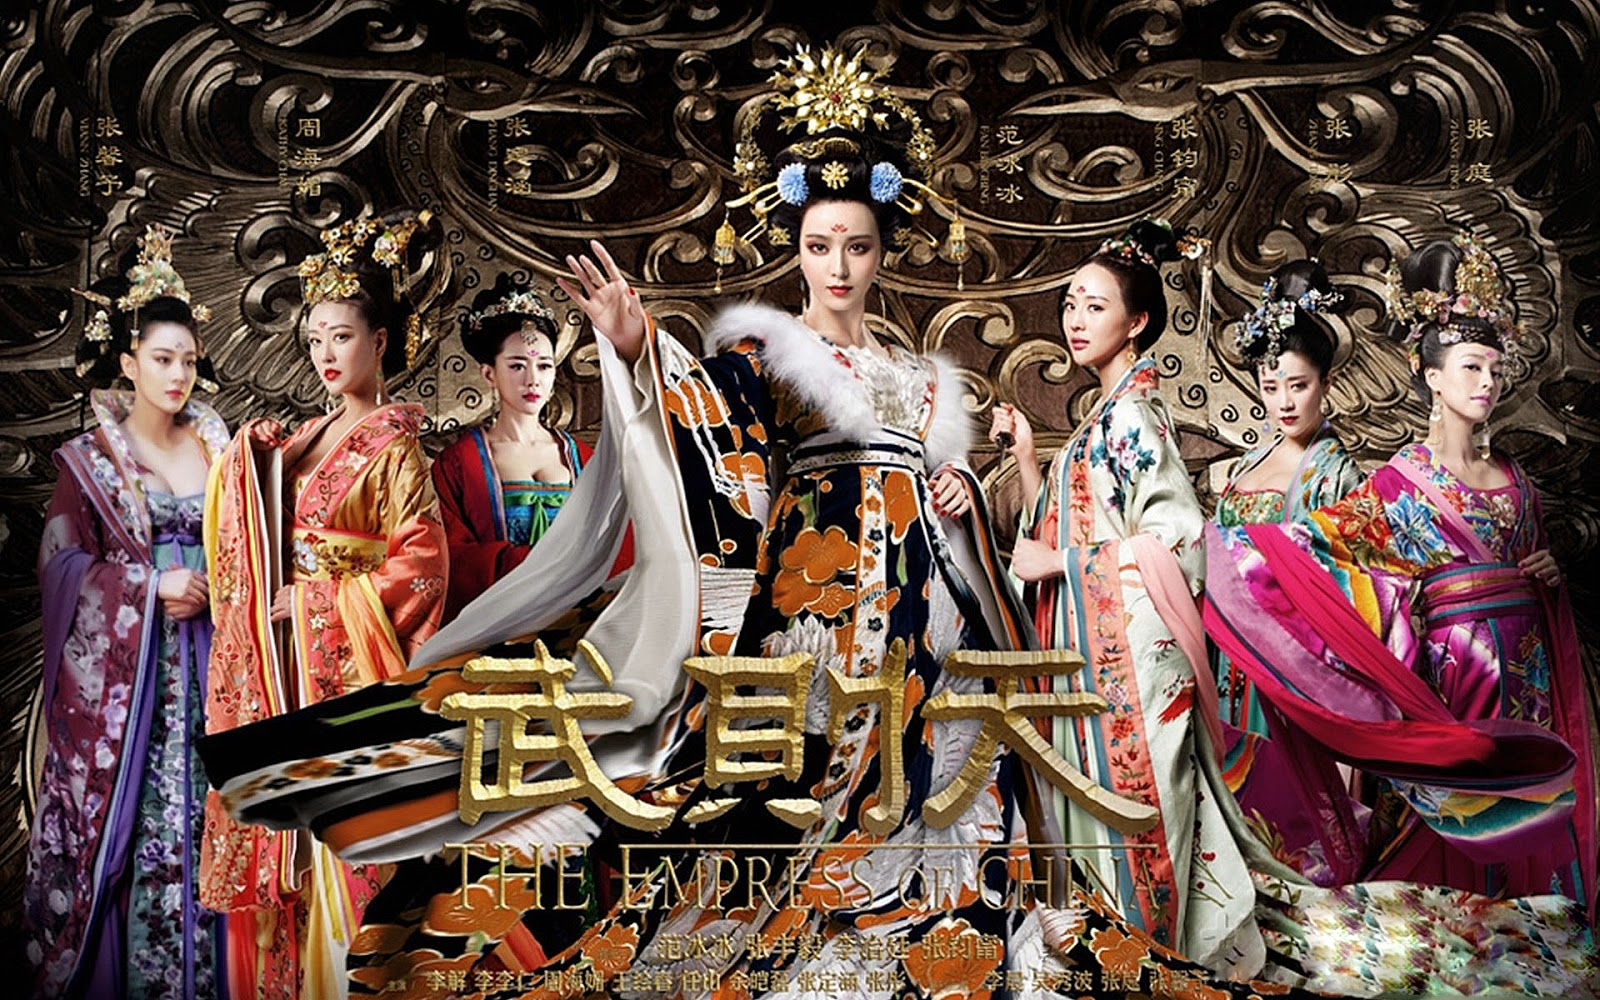 The Empress of China 武媚娘传奇 C-drama review